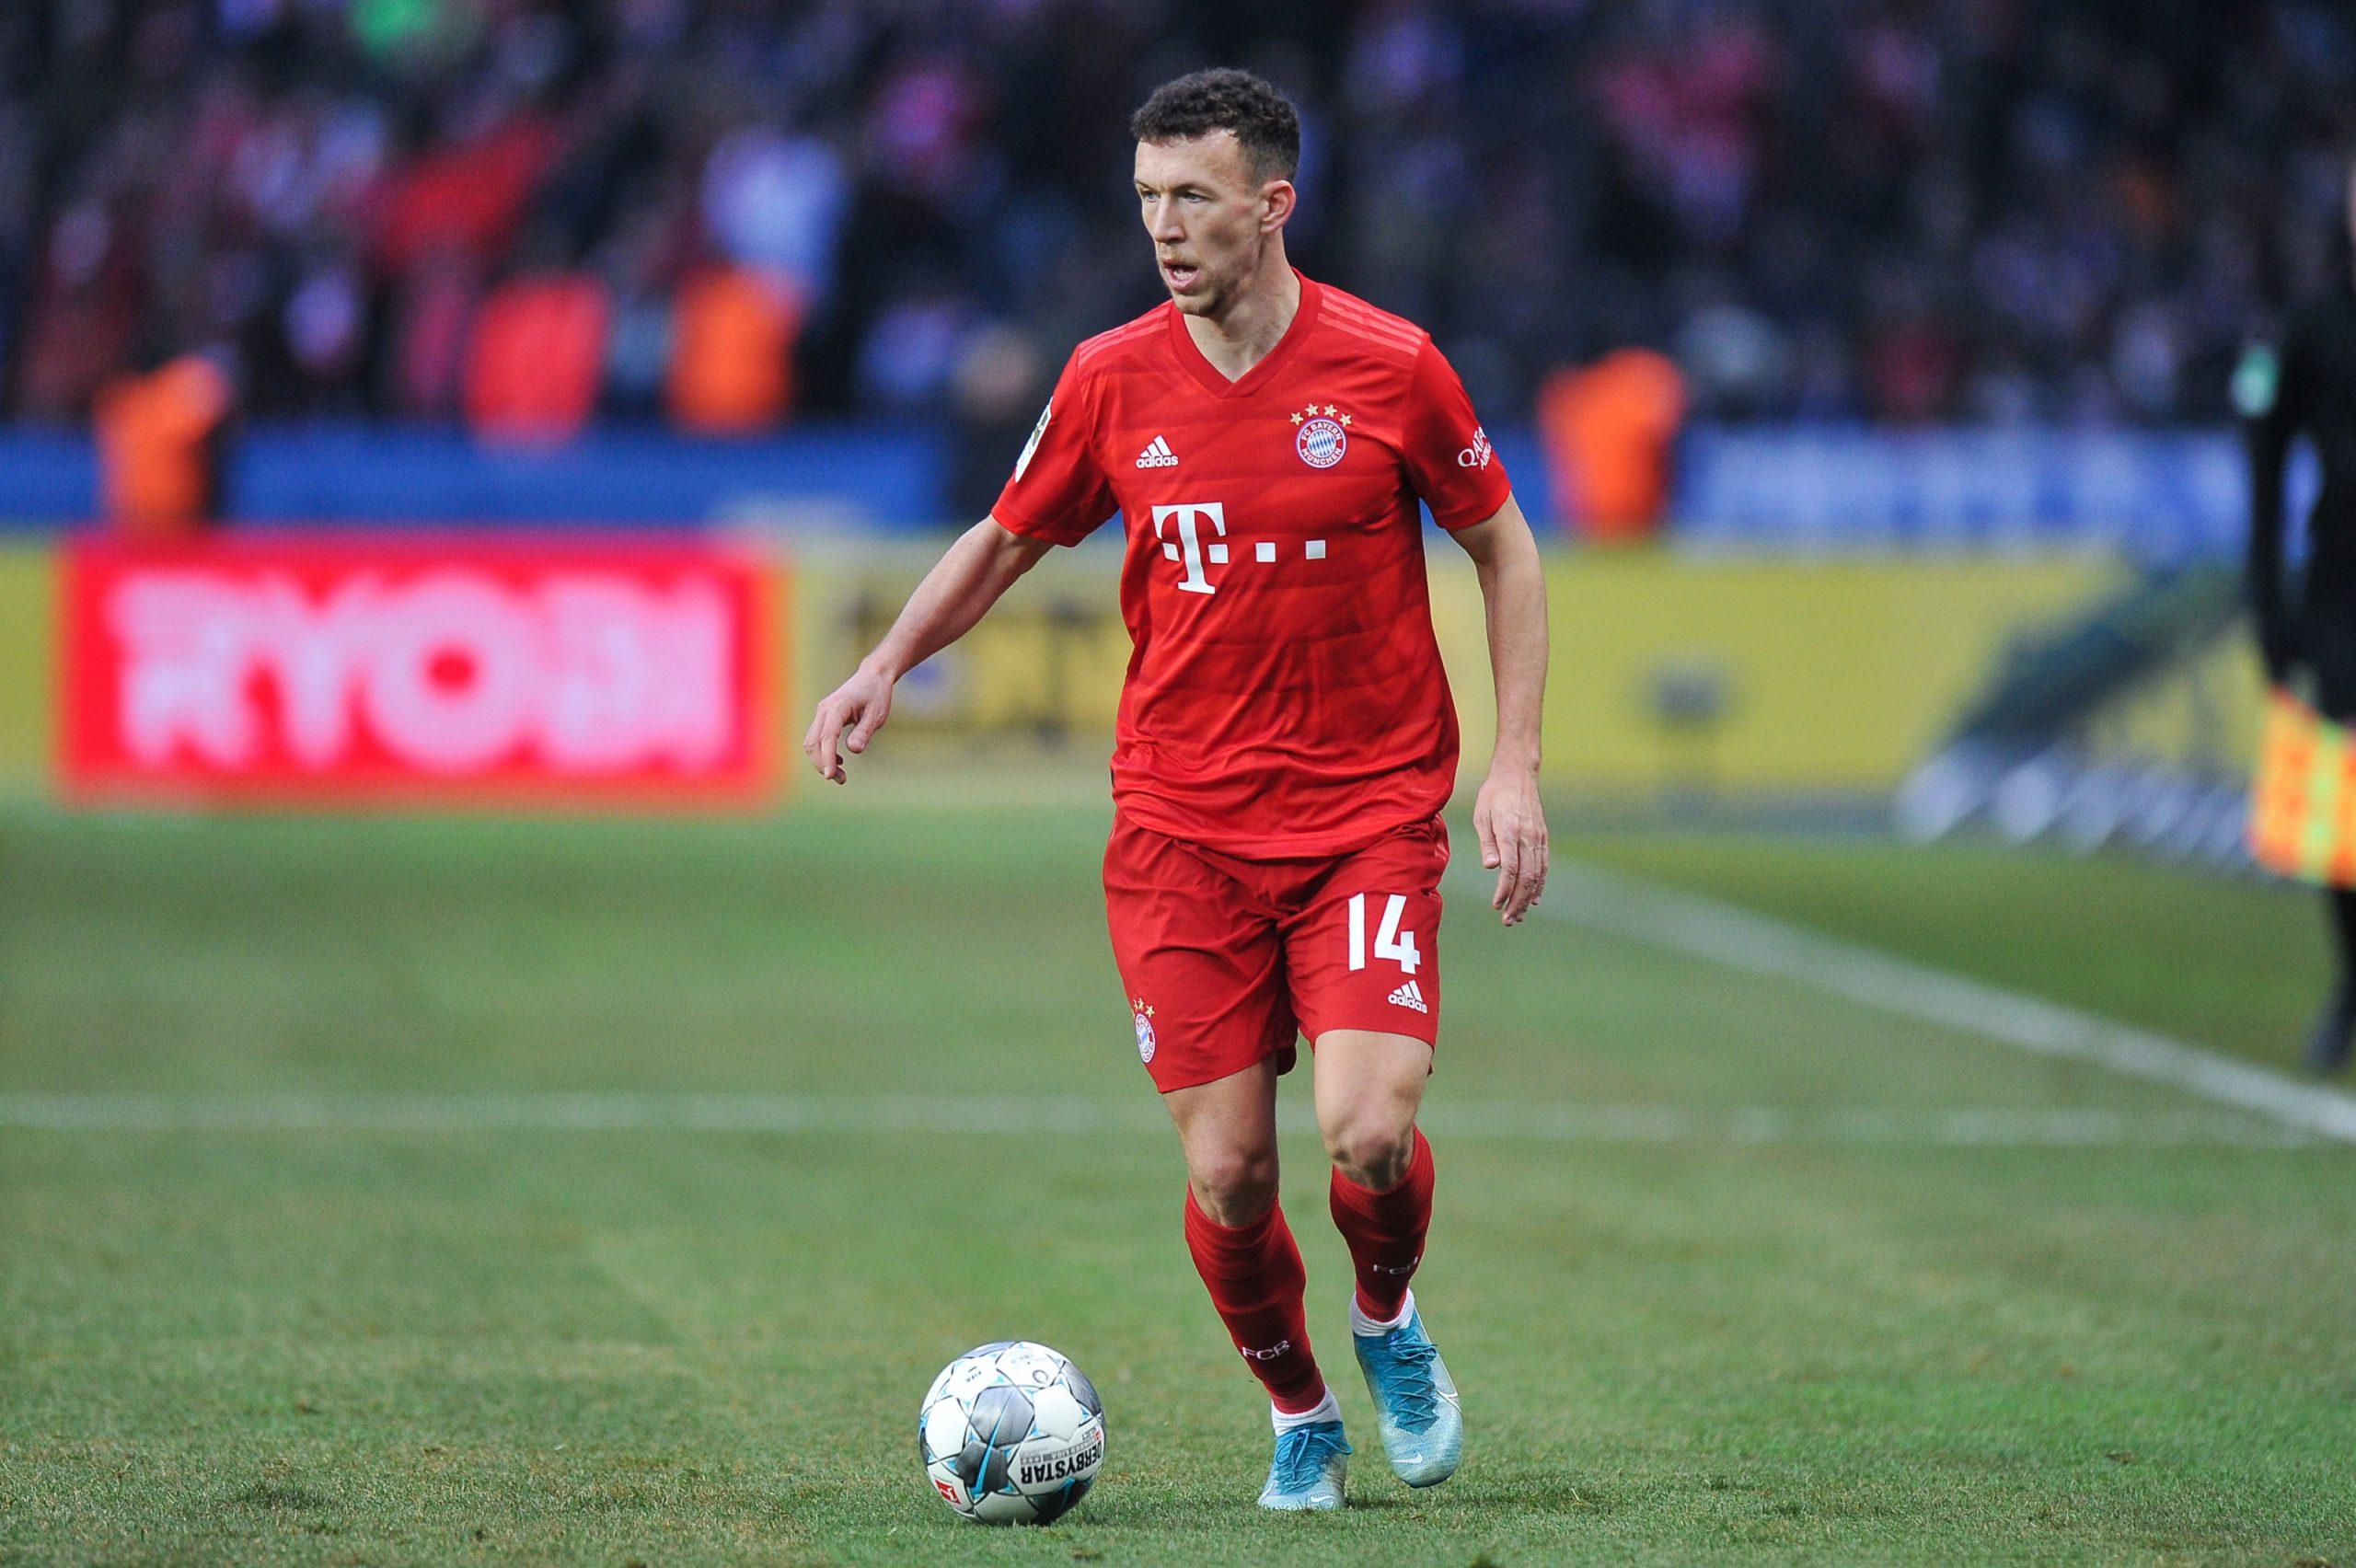 Bayern Munchen po mendon rikthimin e Perisic